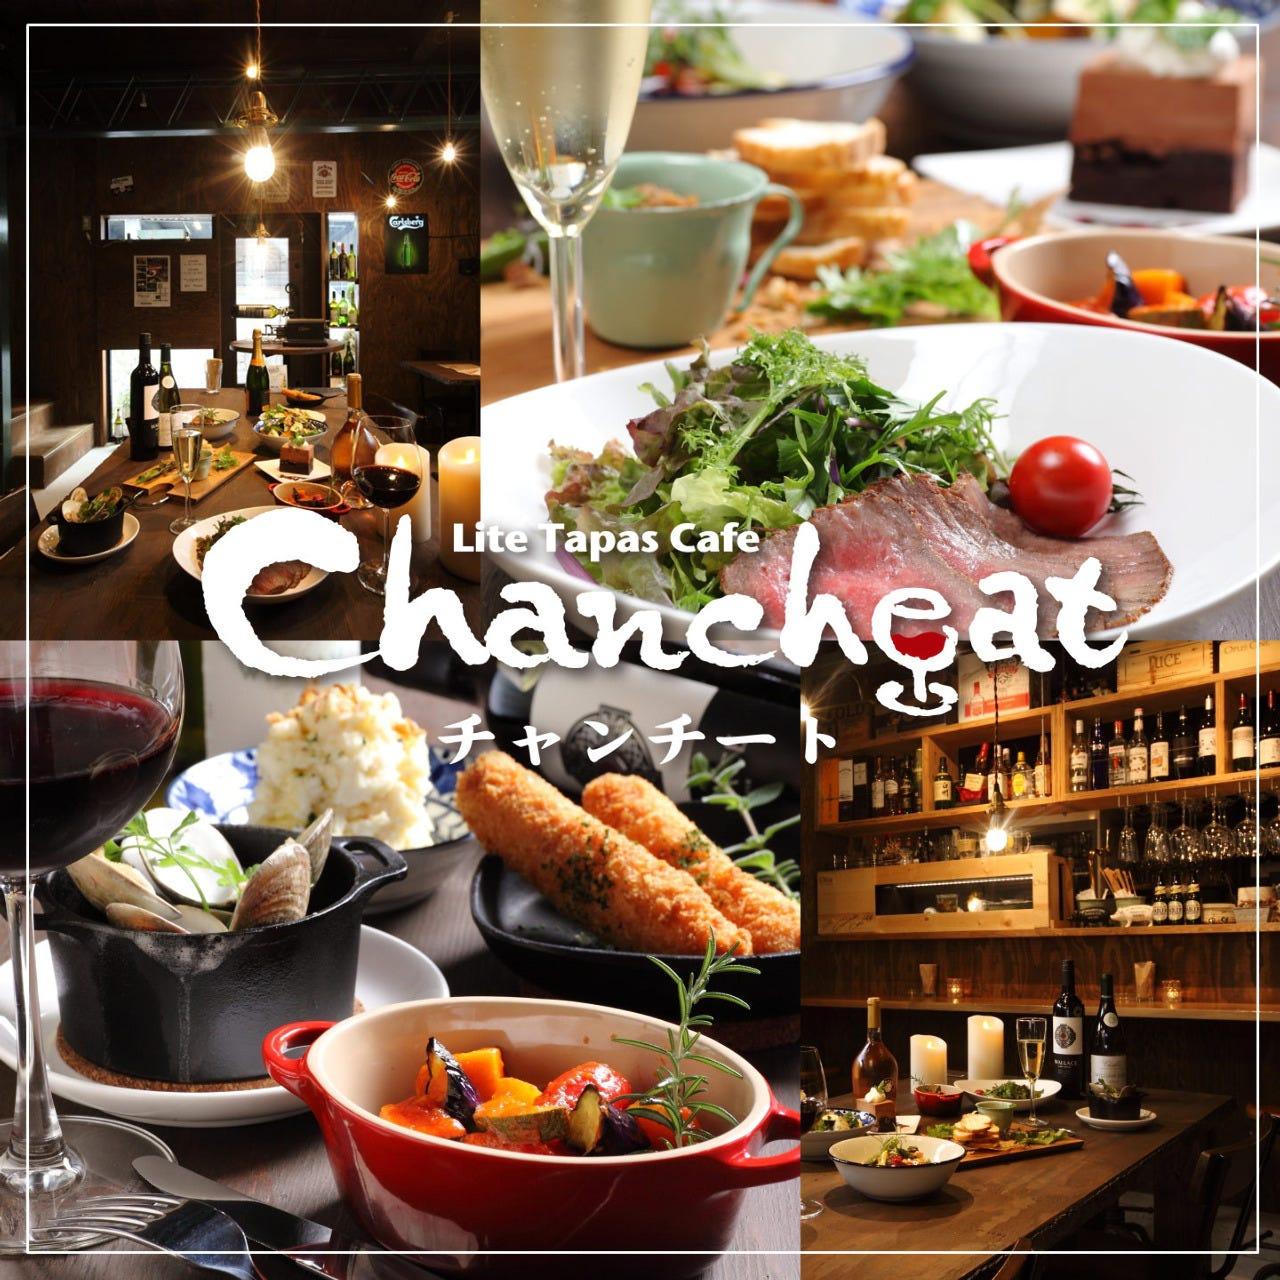 Chancheat